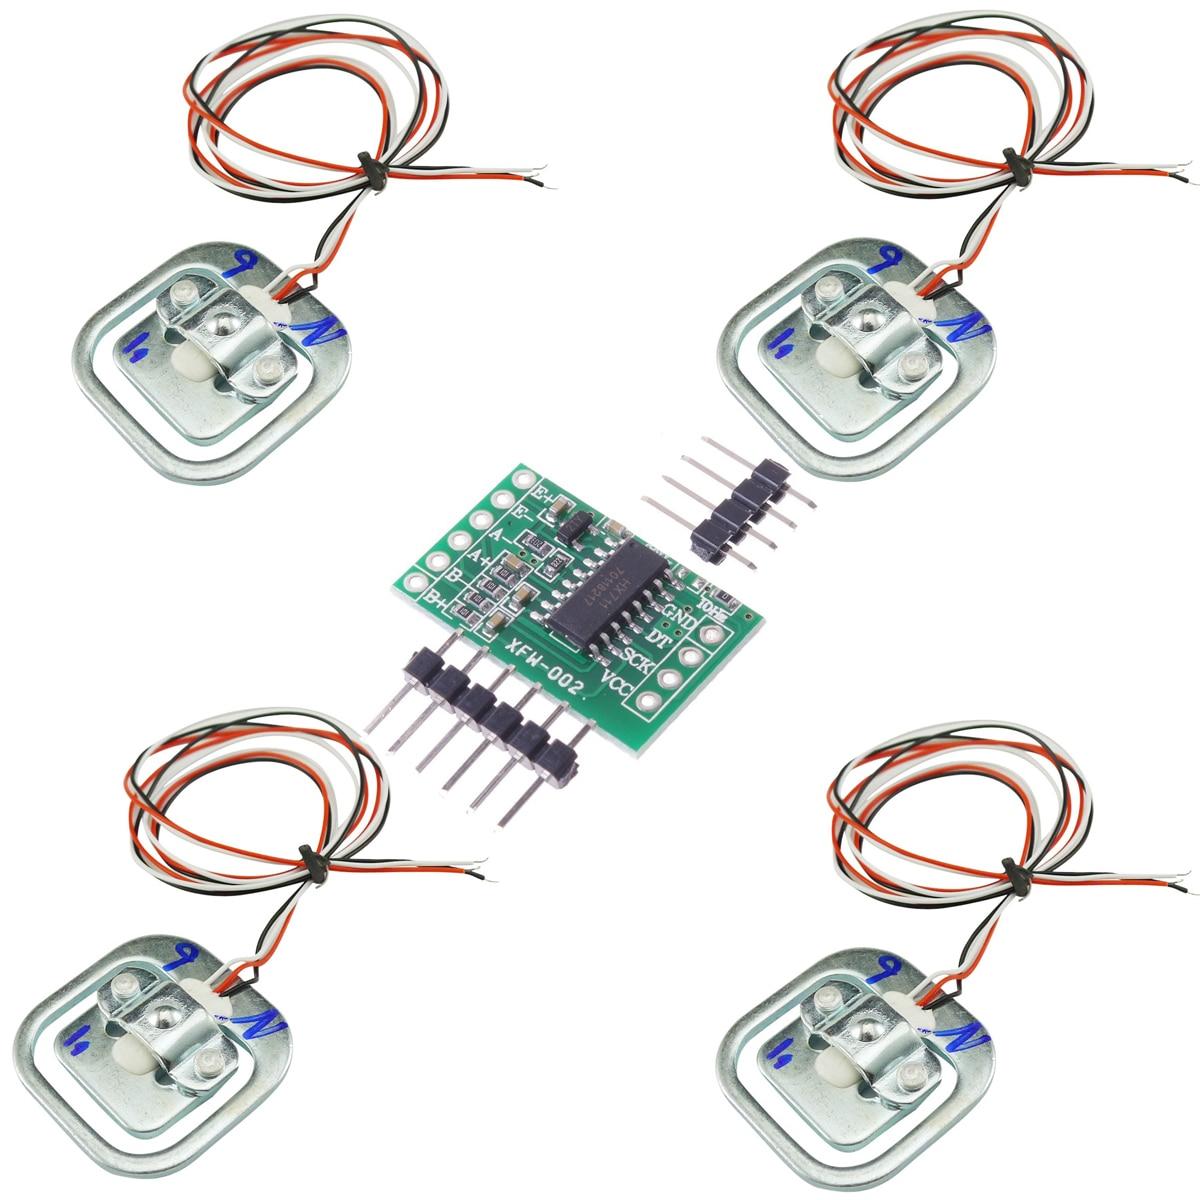 4pcs Human Scale Load Cell Weight Weighting Sensor 50KG Half-bridge with Amplifier HX711 AD Module Strain Gauge Bathroom Scale